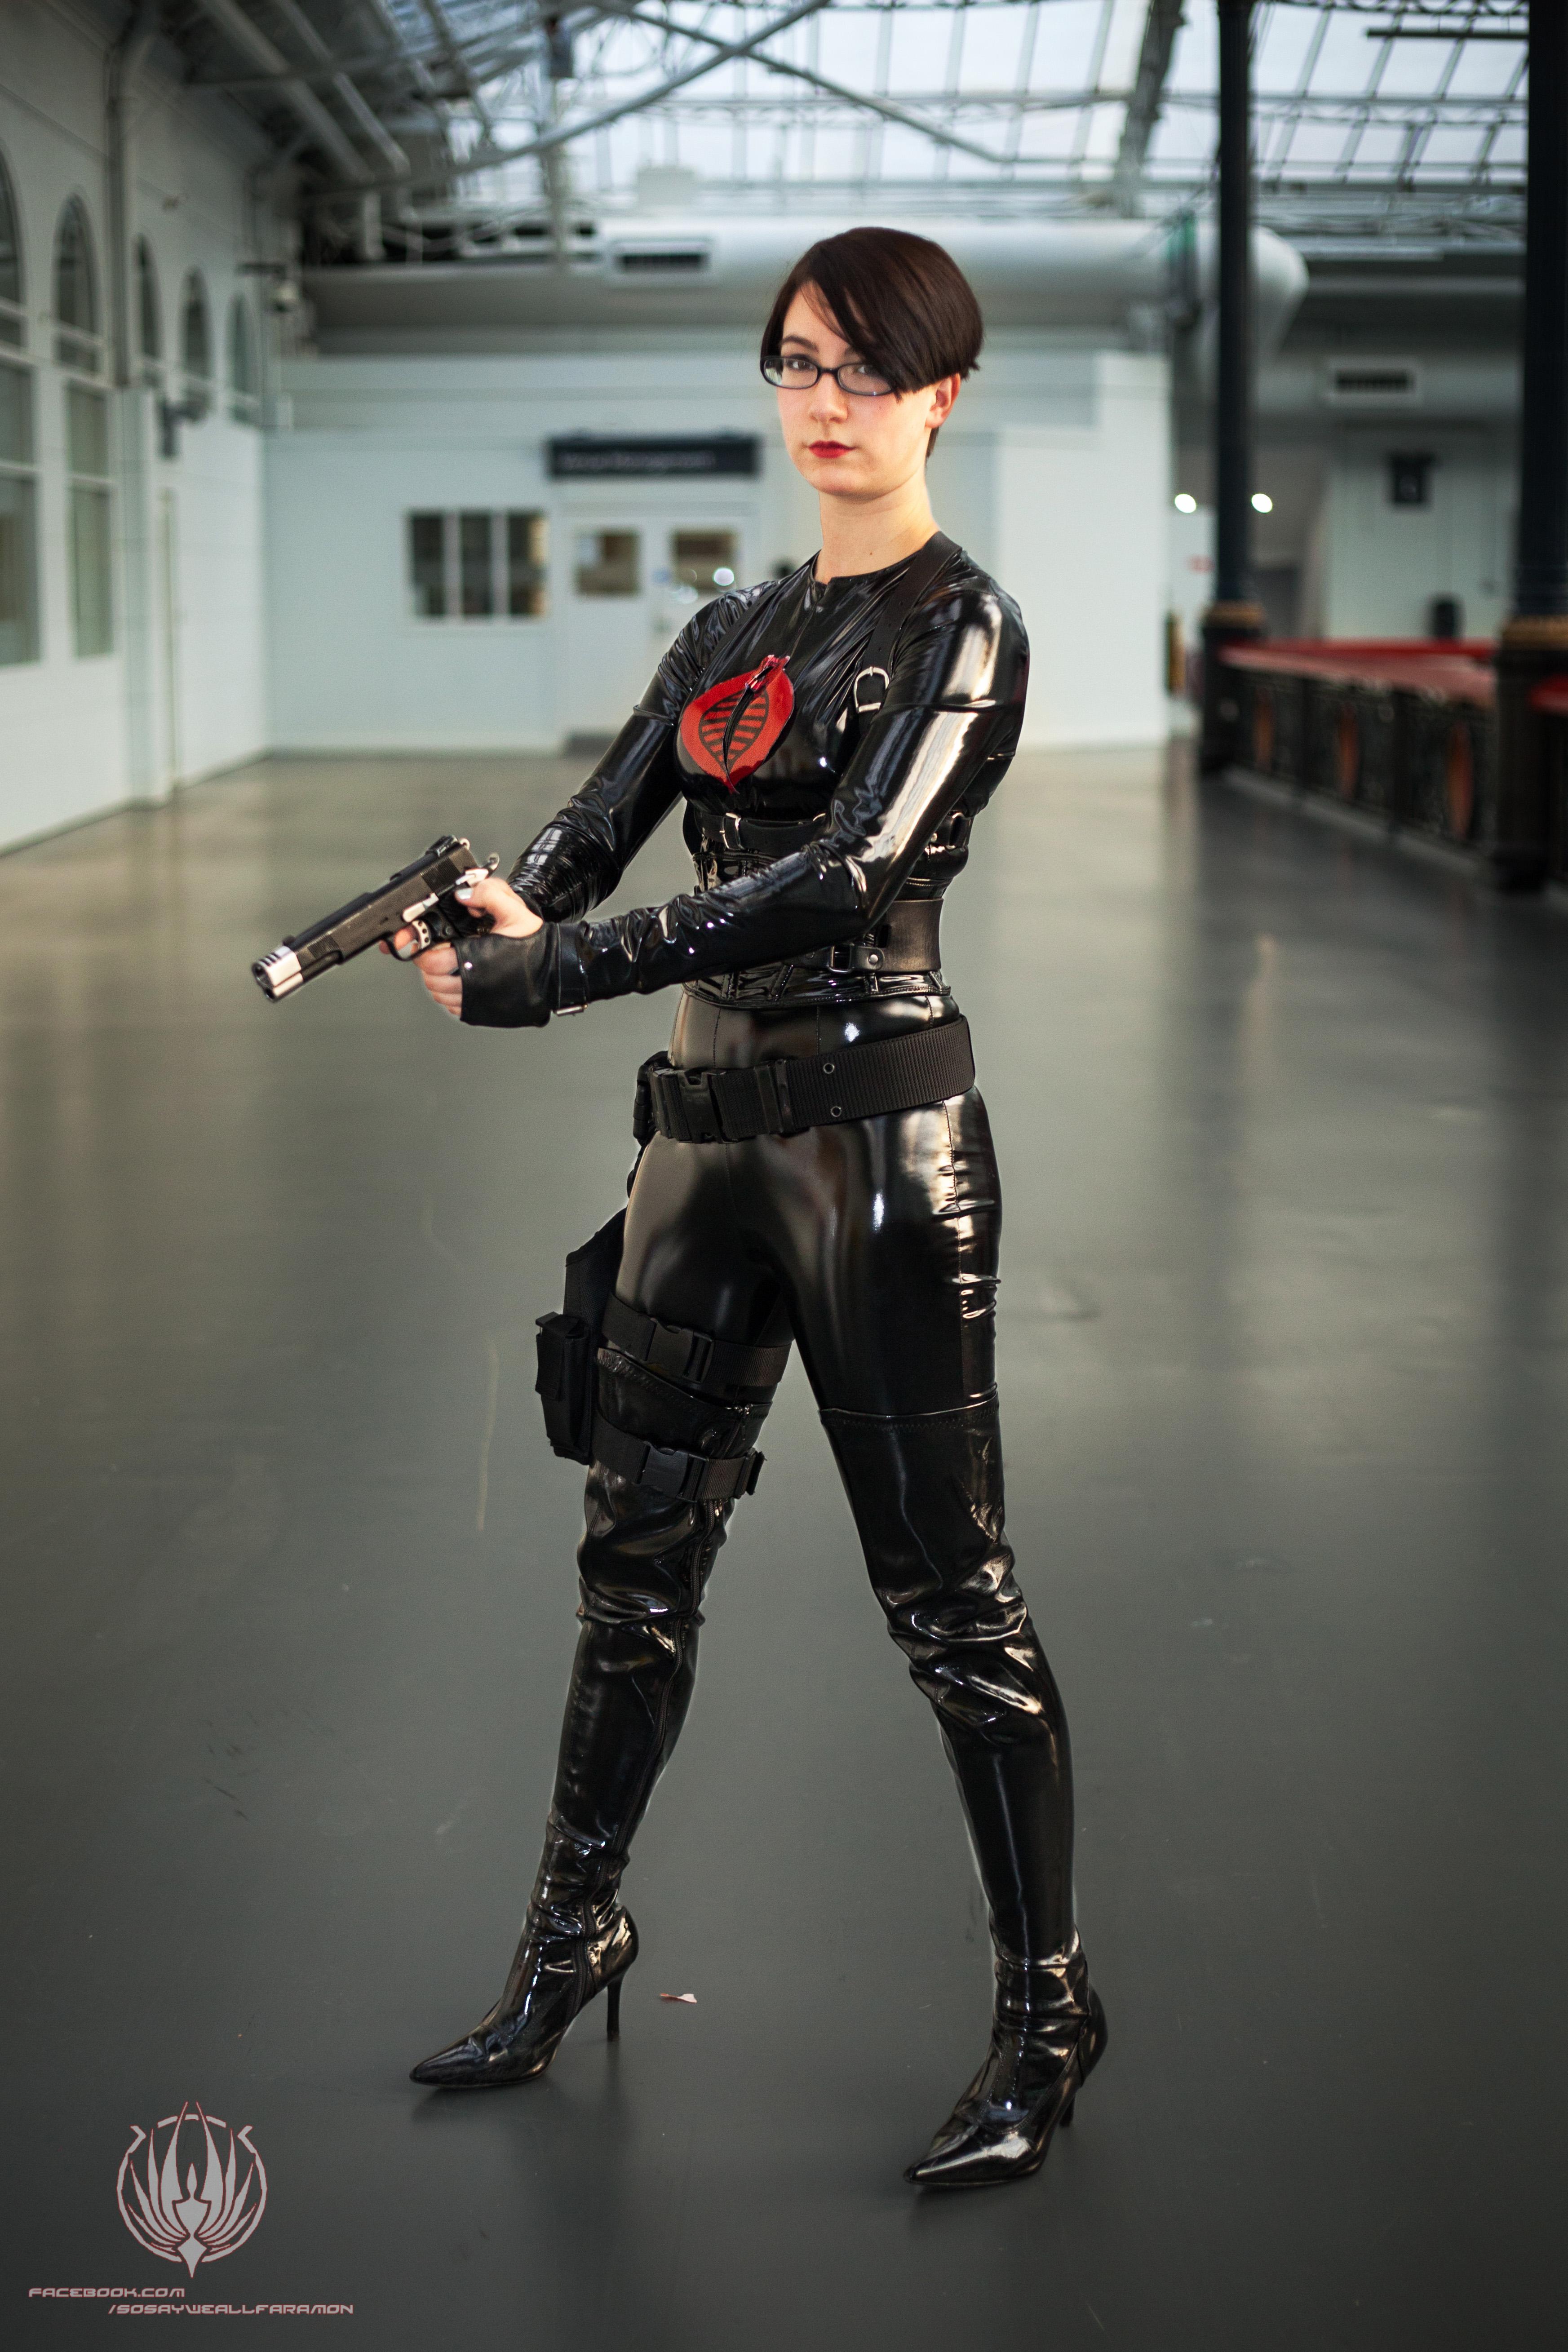 G.I. Joe - Baroness Full Shot by faramon